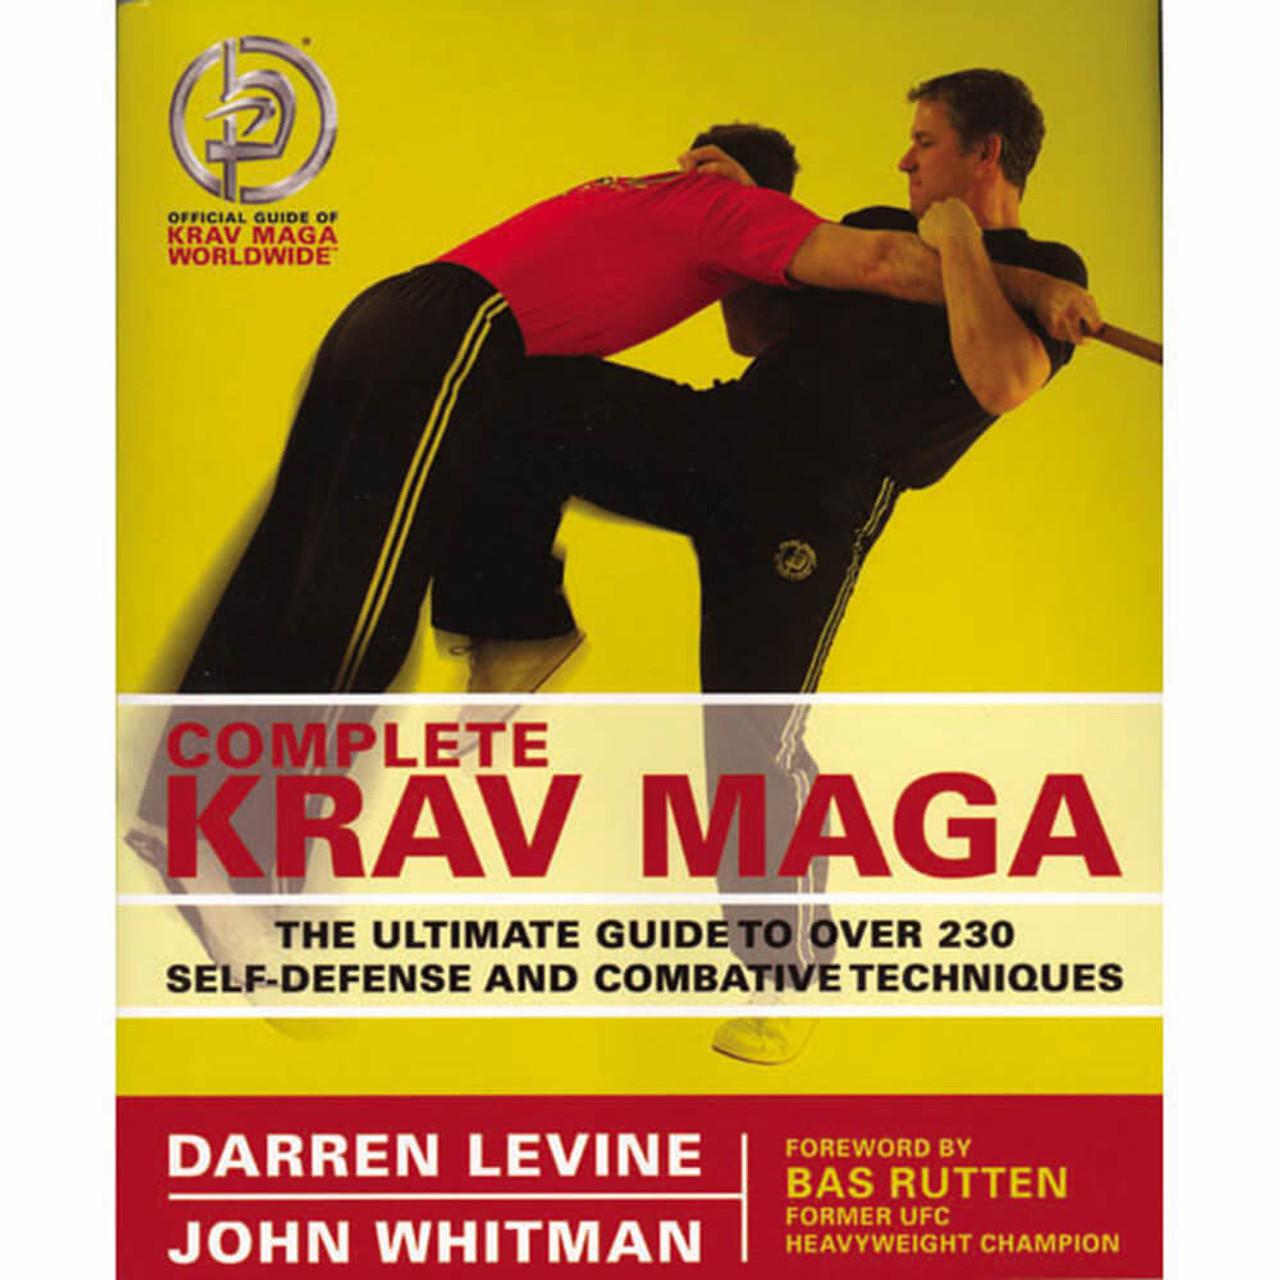 Complete Krav Maga - 2nd Edition Book